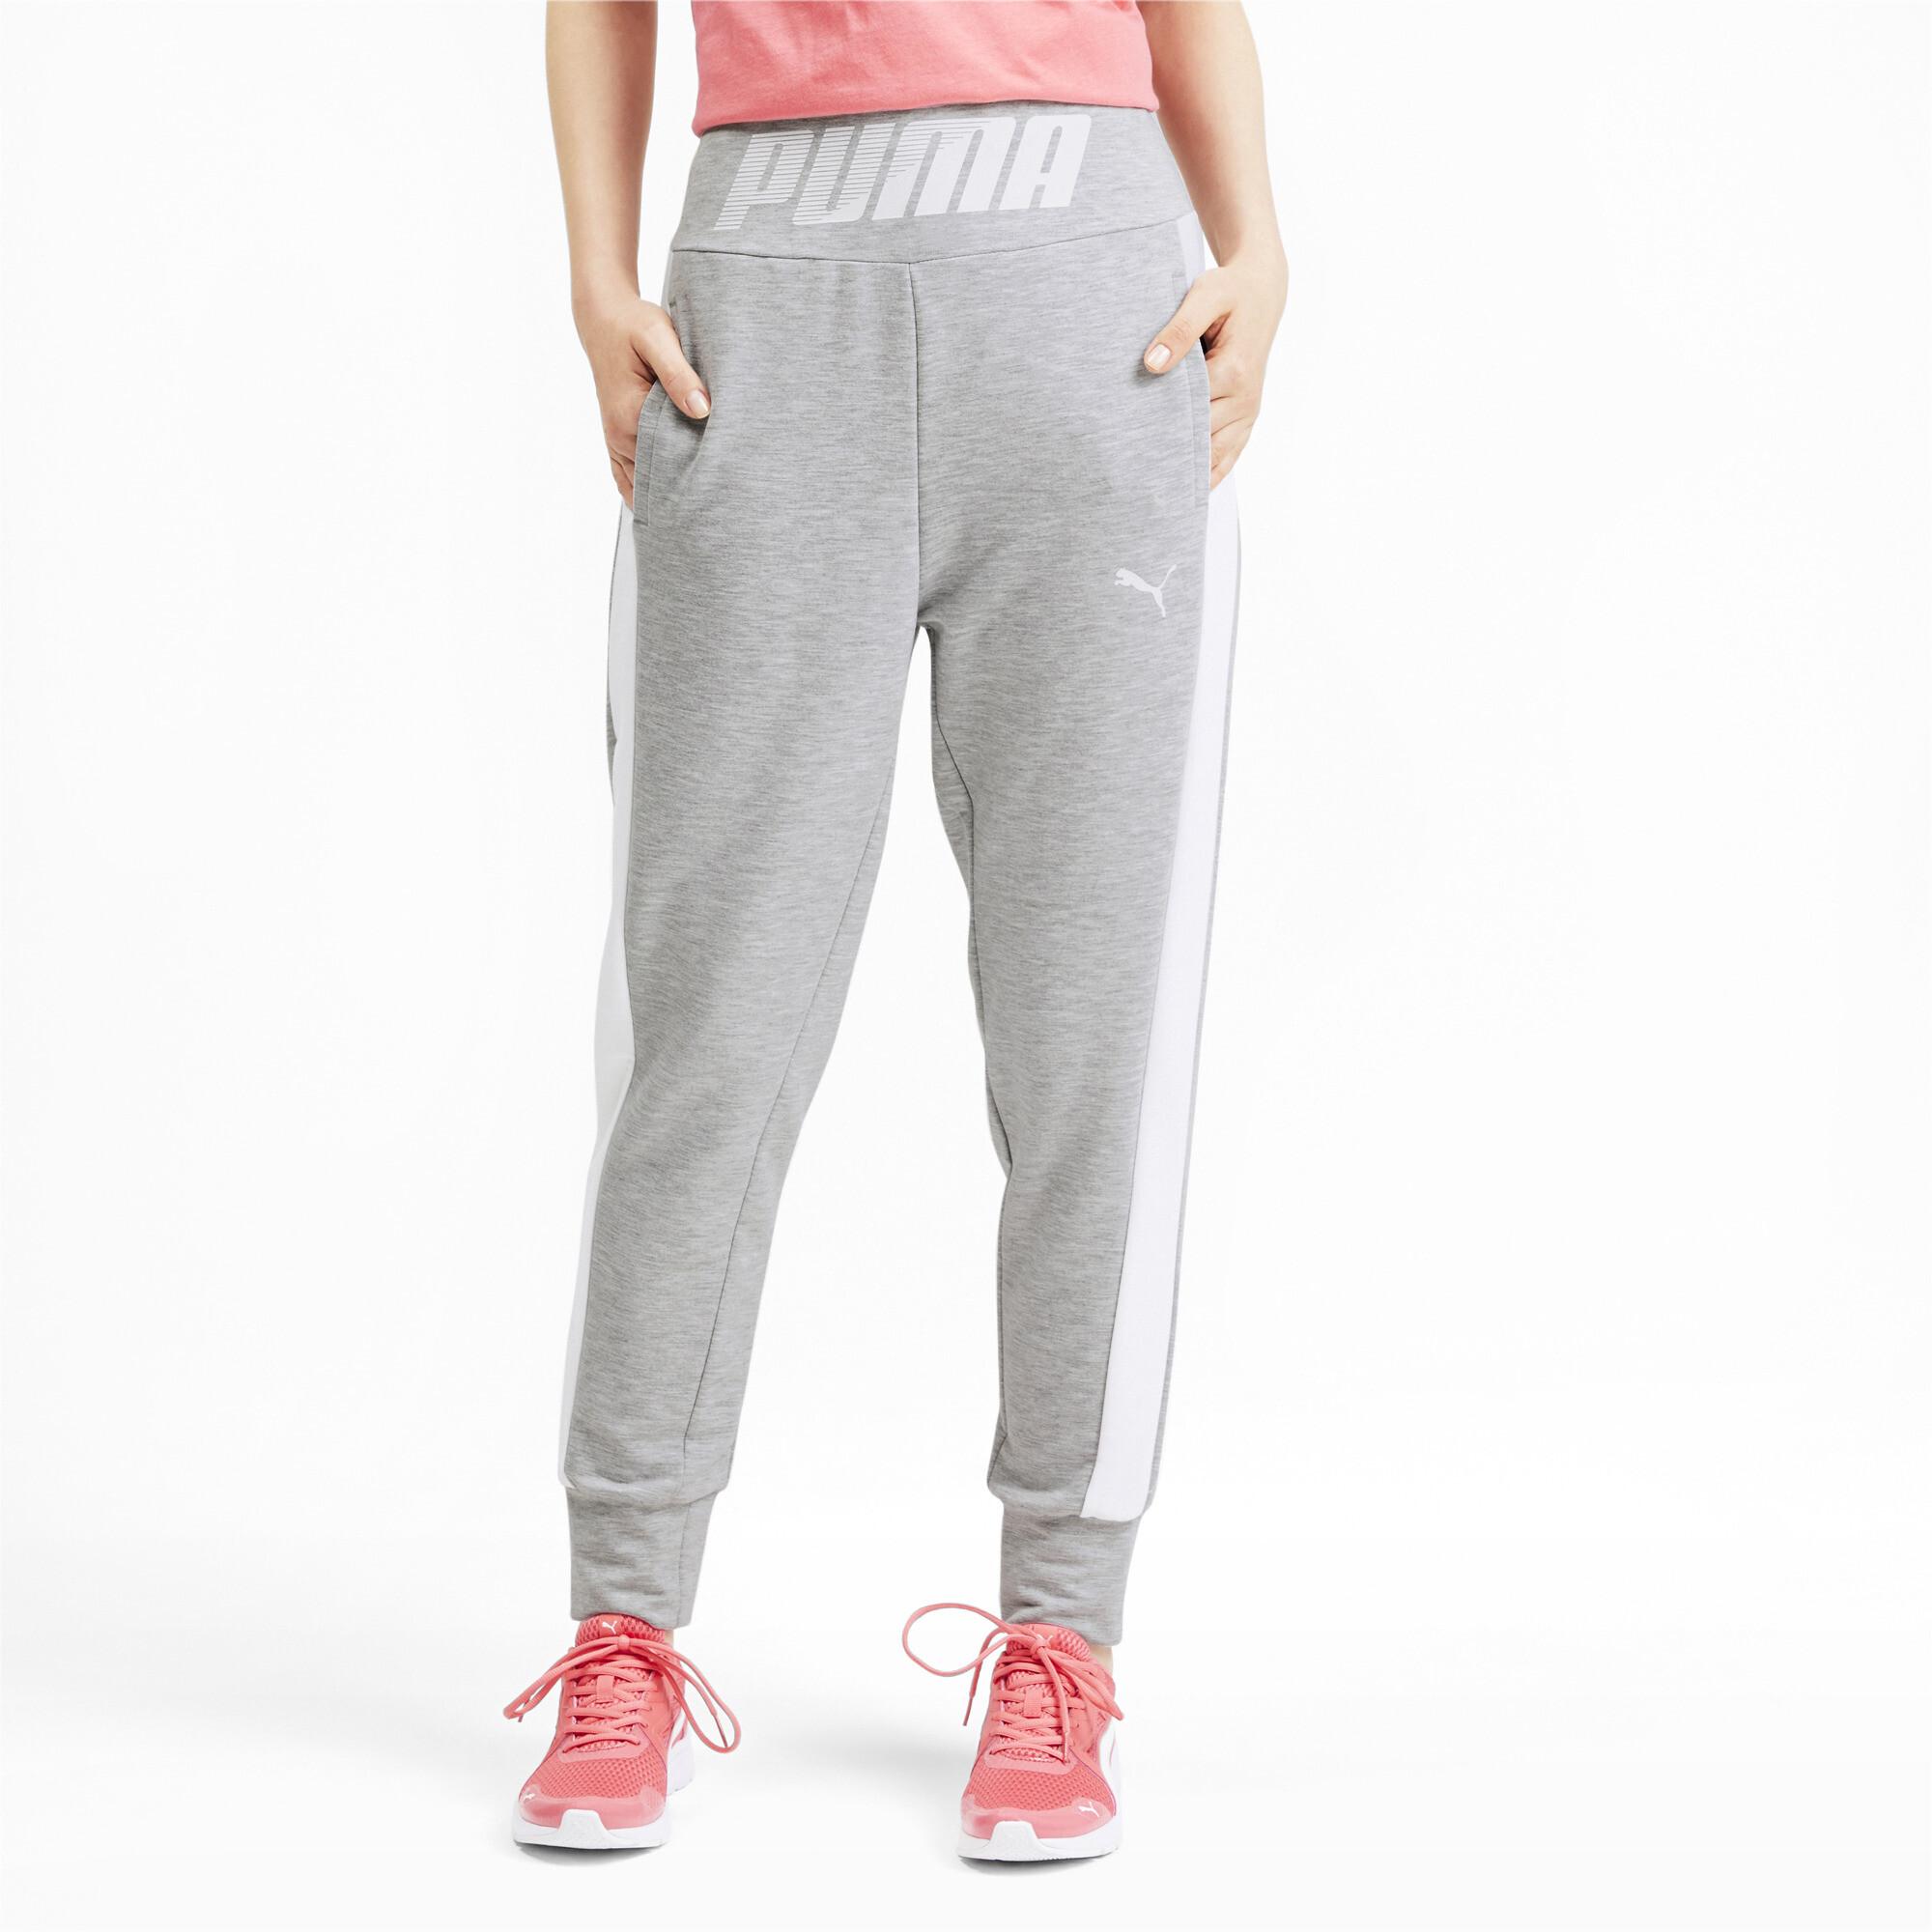 PUMA-Modern-Sports-Women-039-s-Track-Pants-Women-Knitted-Pants-Basics thumbnail 9